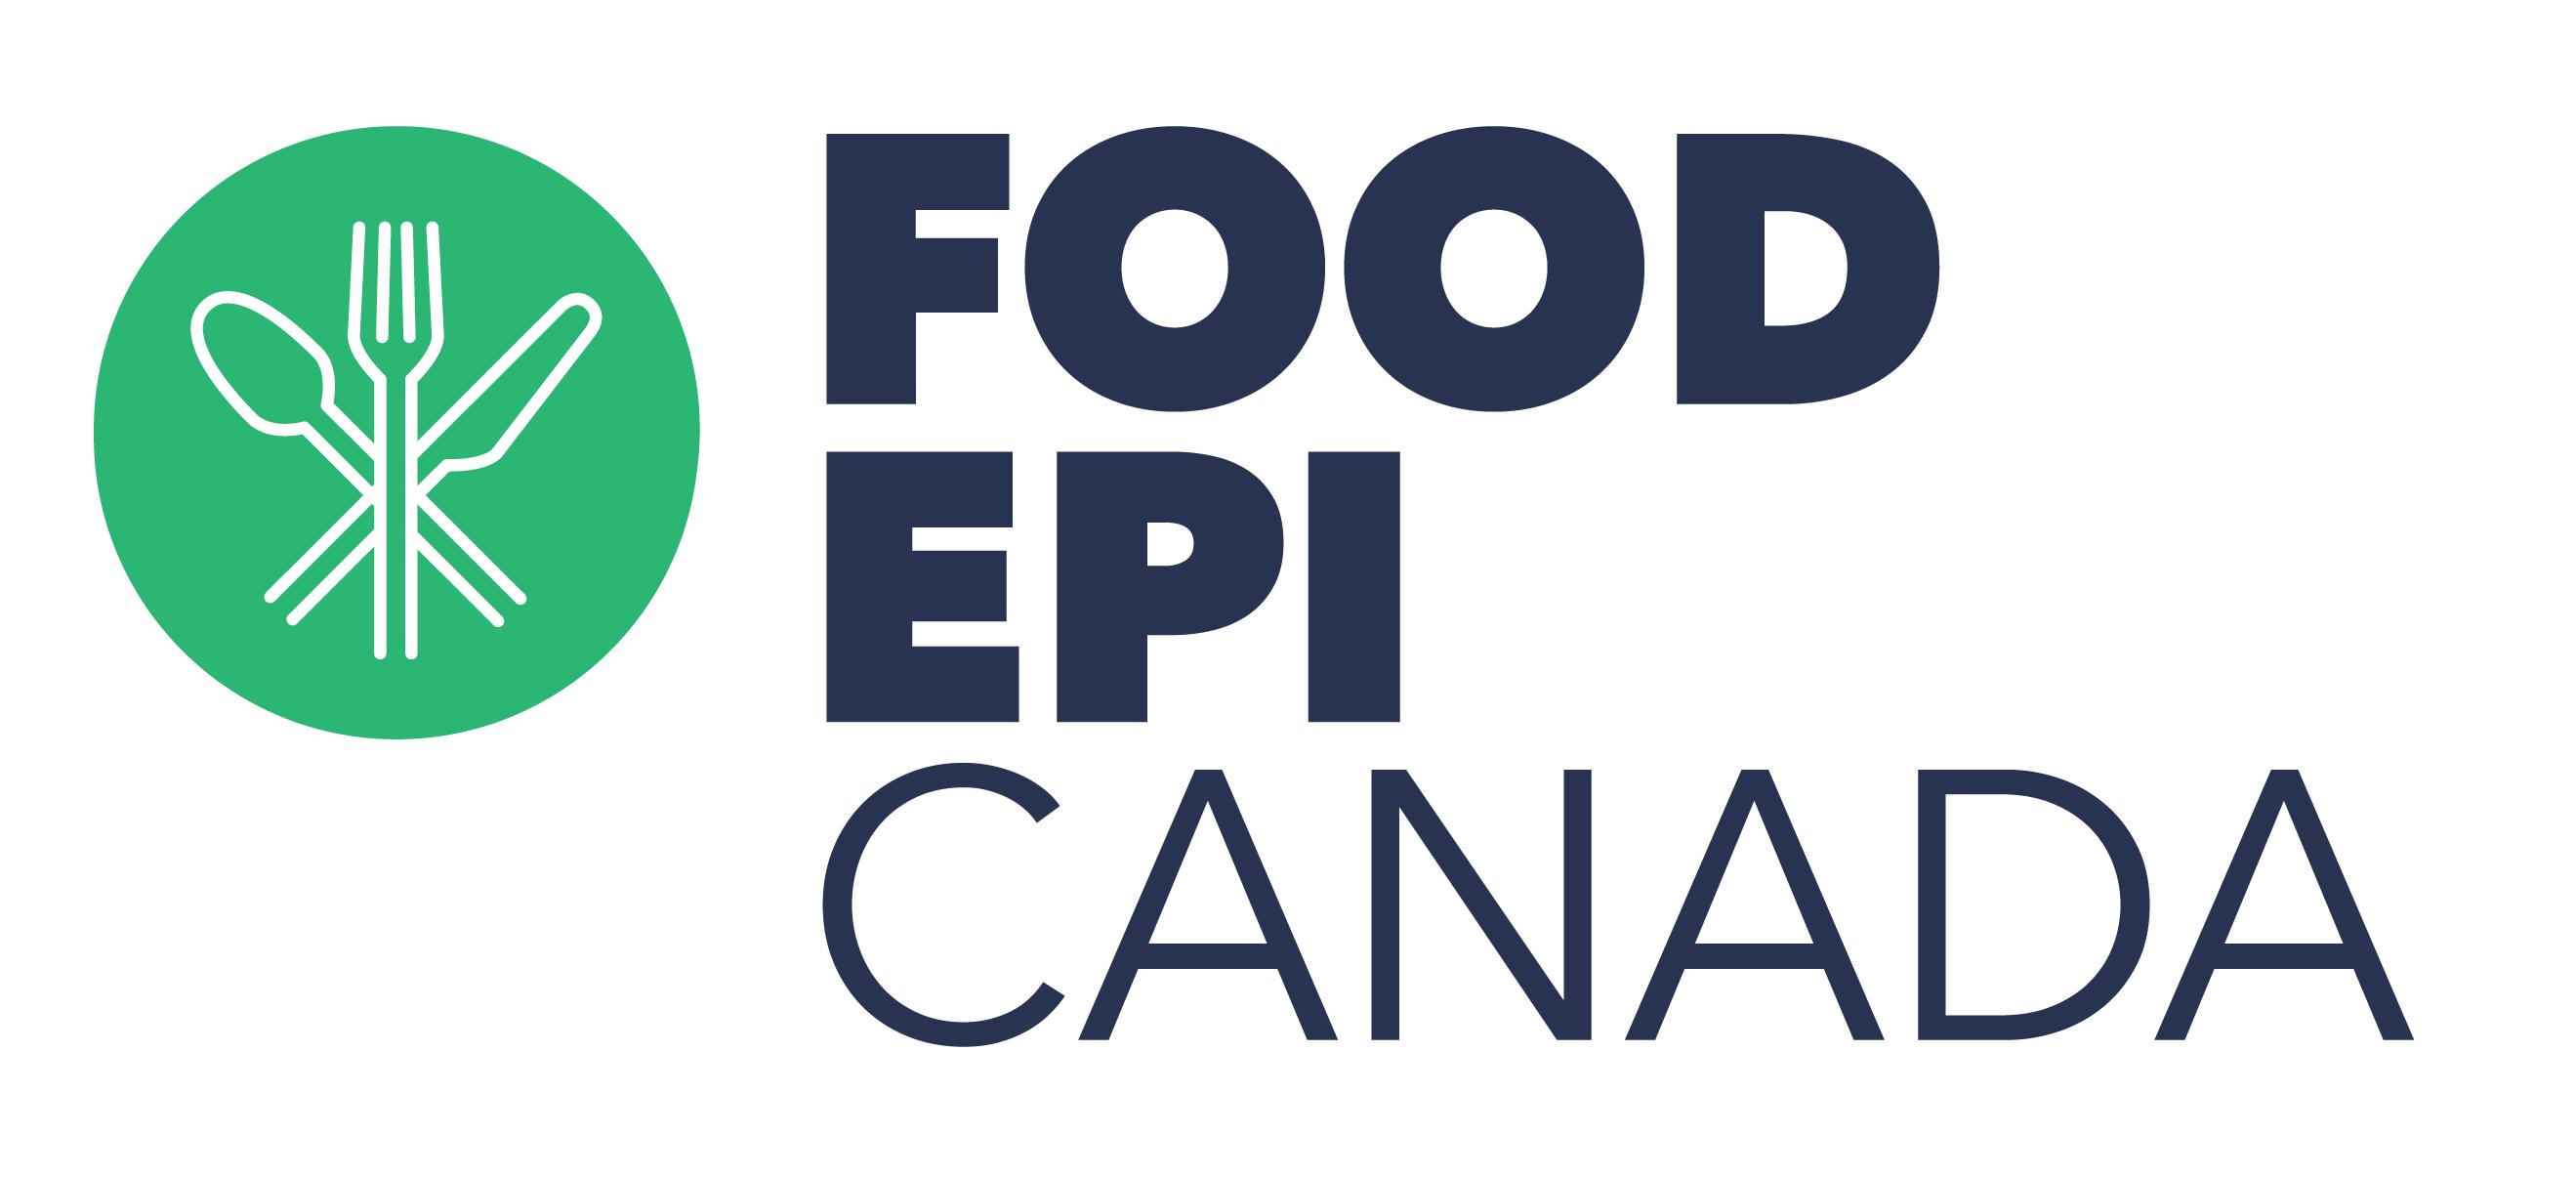 Food-EPI Canada 2017